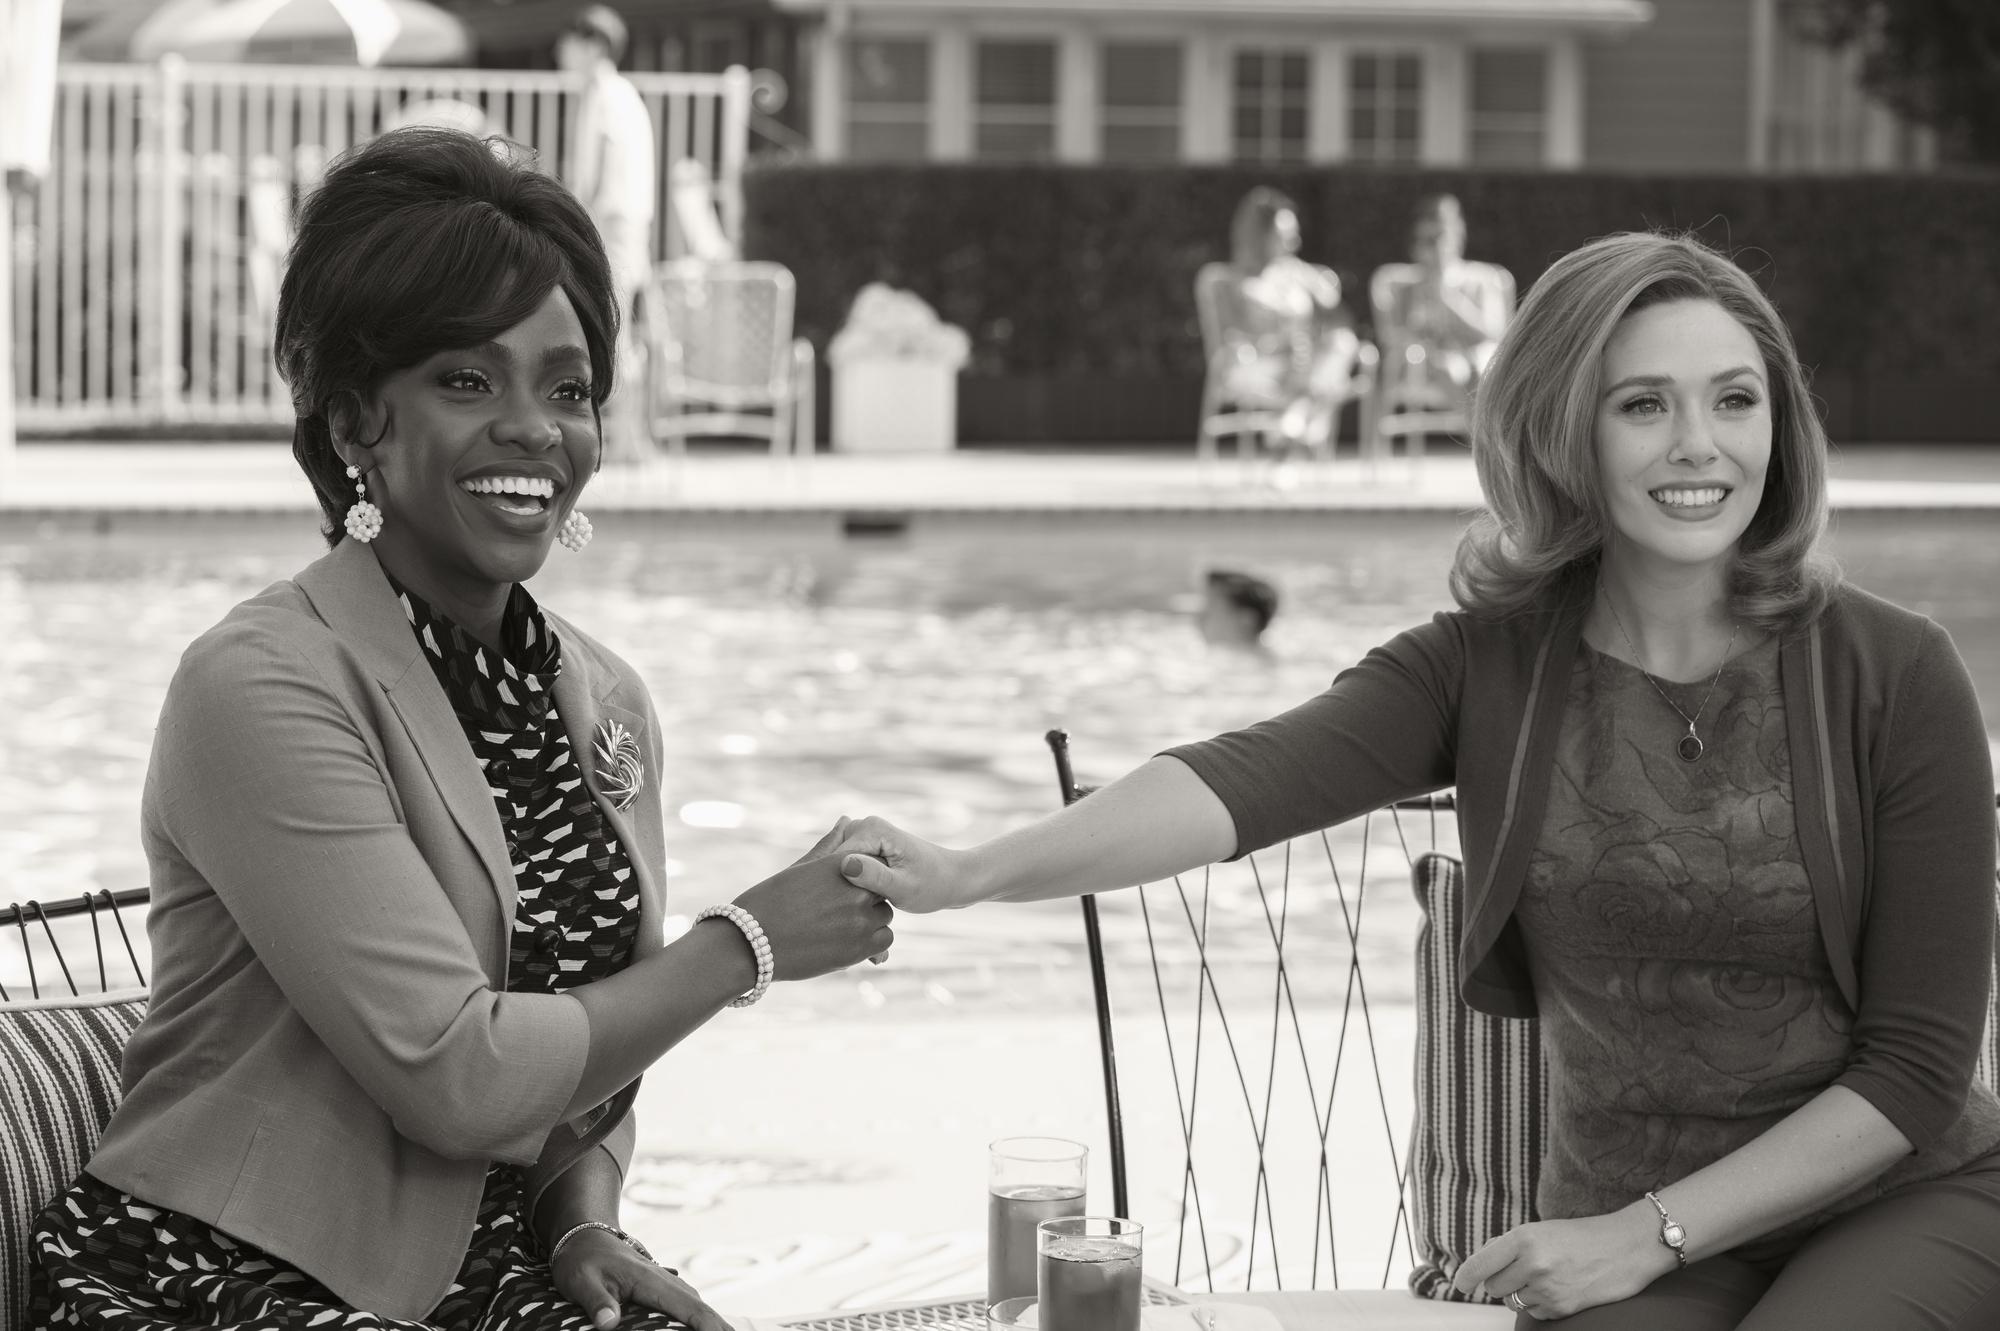 Teyonah Parris as Monica Rambeau/Geraldine and Elizabeth Olsen as Wanda in 'WandaVision'